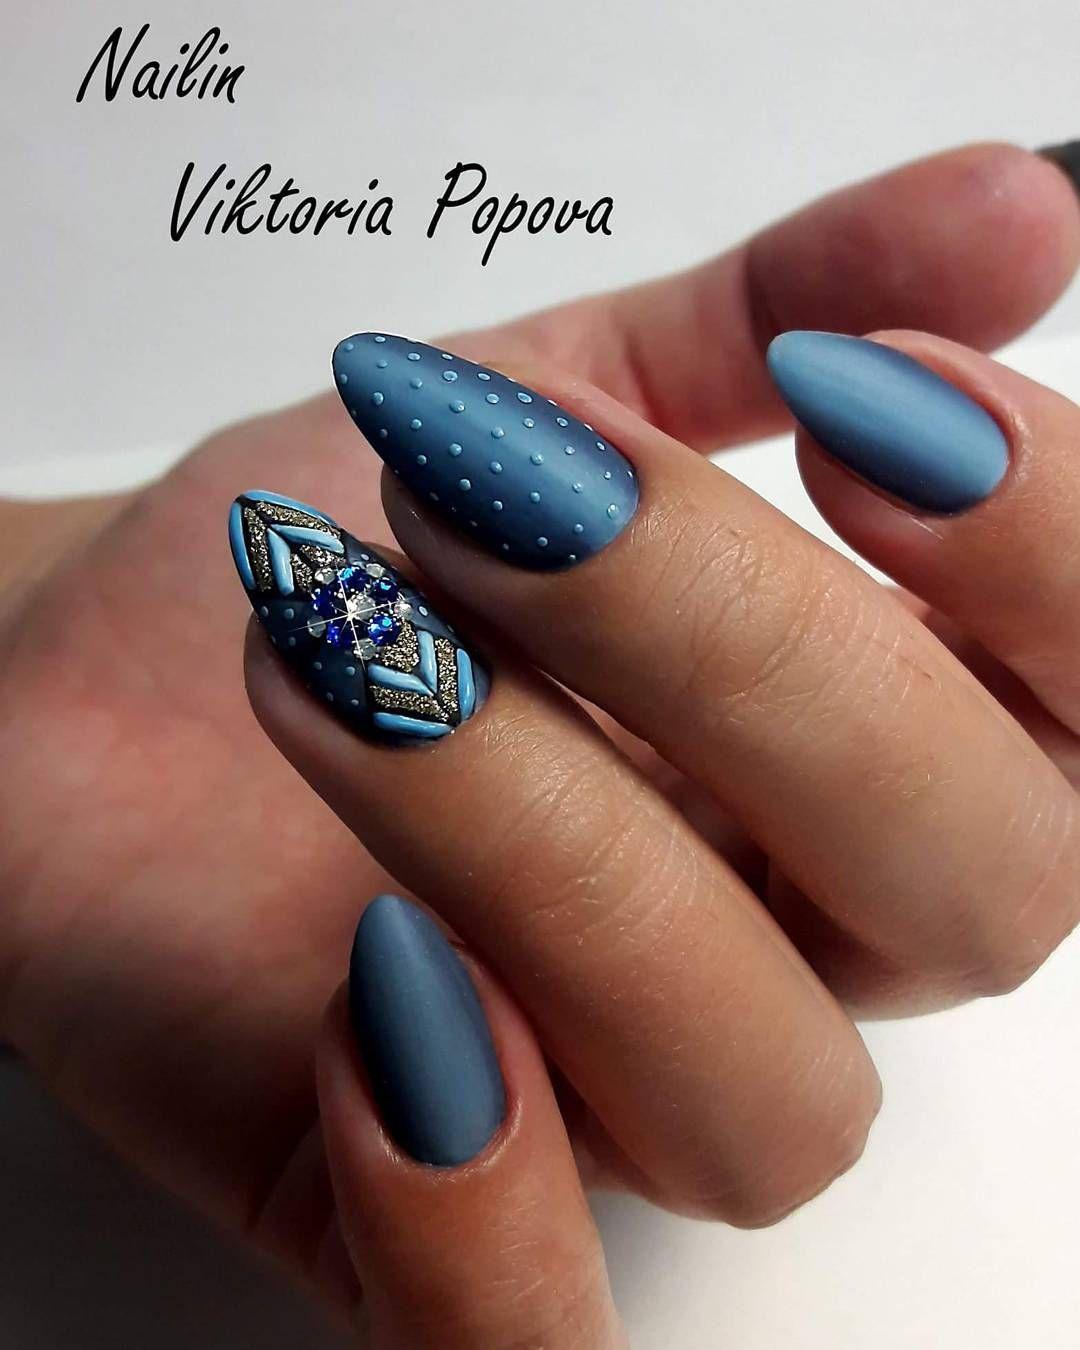 Pin van mirka gaal op nails :) | Pinterest - Nagel, Blauwe nagels en ...